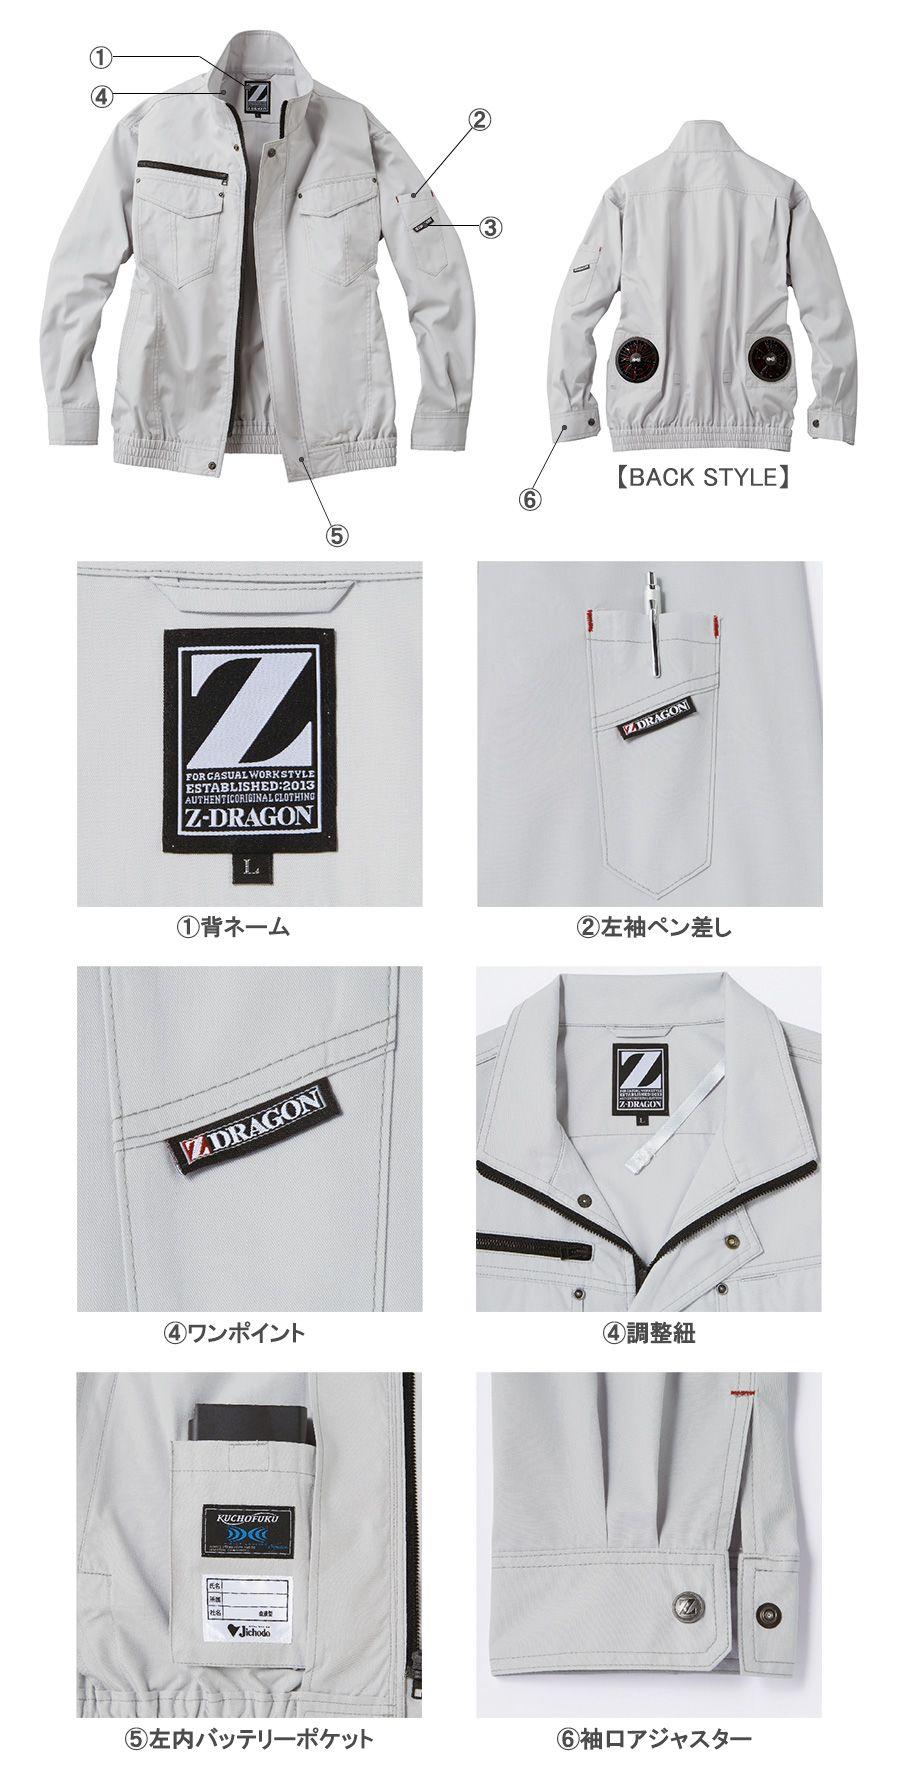 【Z-DRAGON】空調服セット【WEB限定特価】送料無料(旧型)